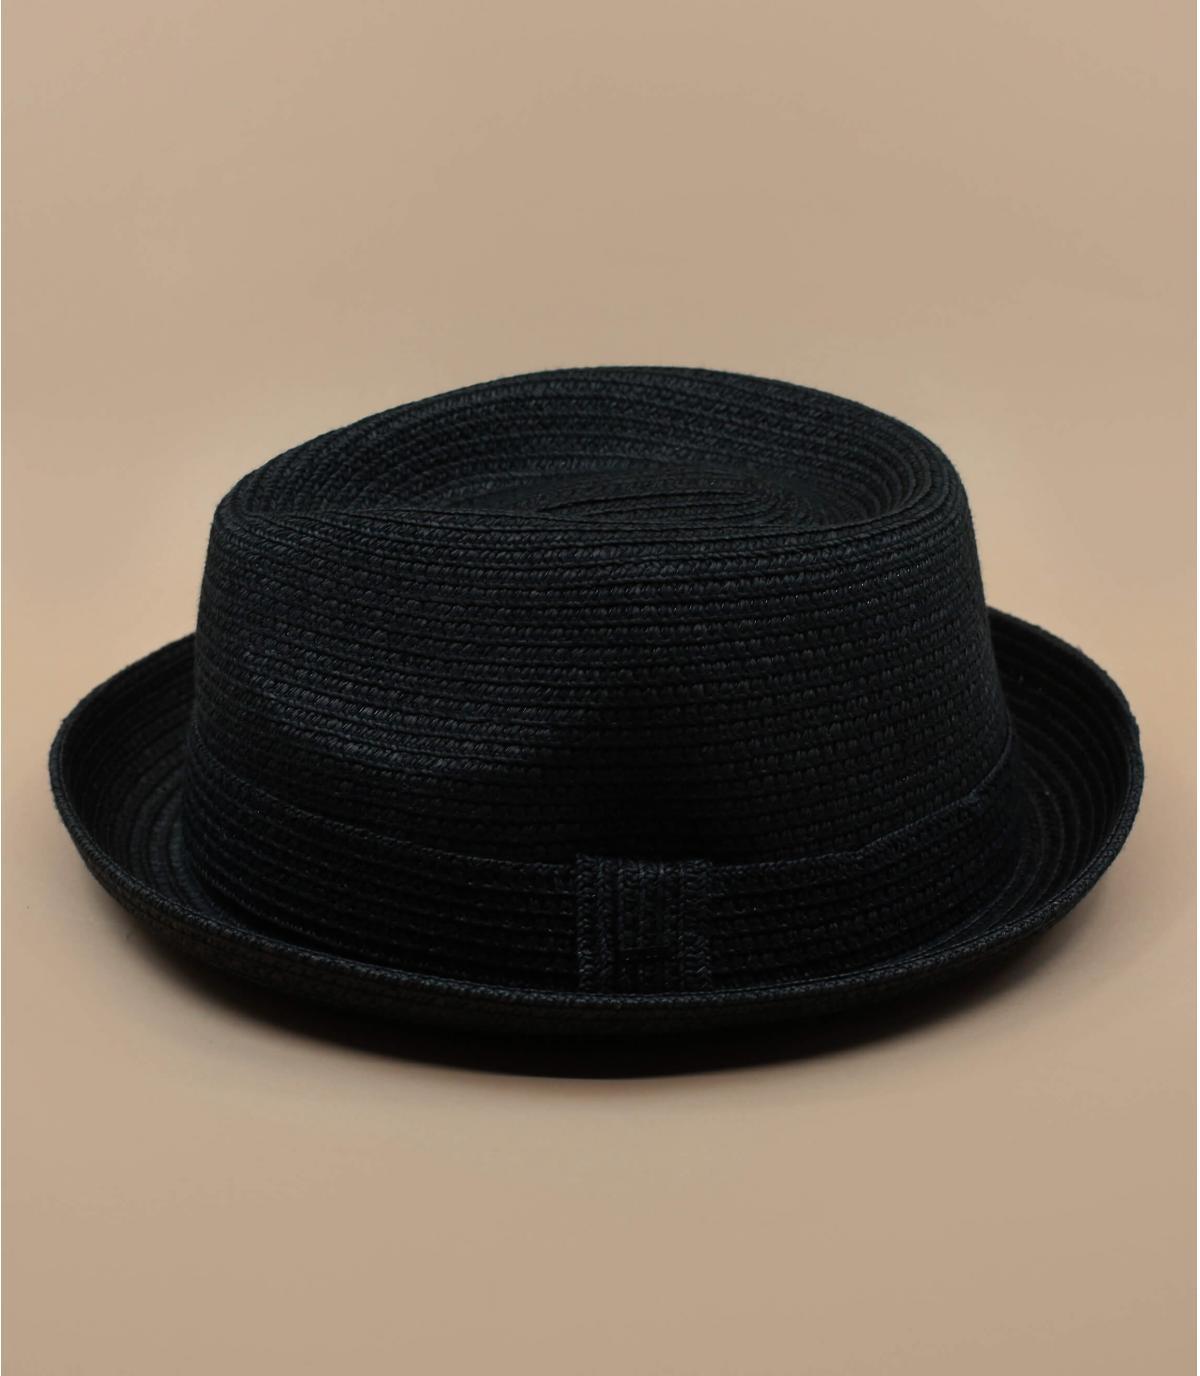 Détails Billy black hat - image 2